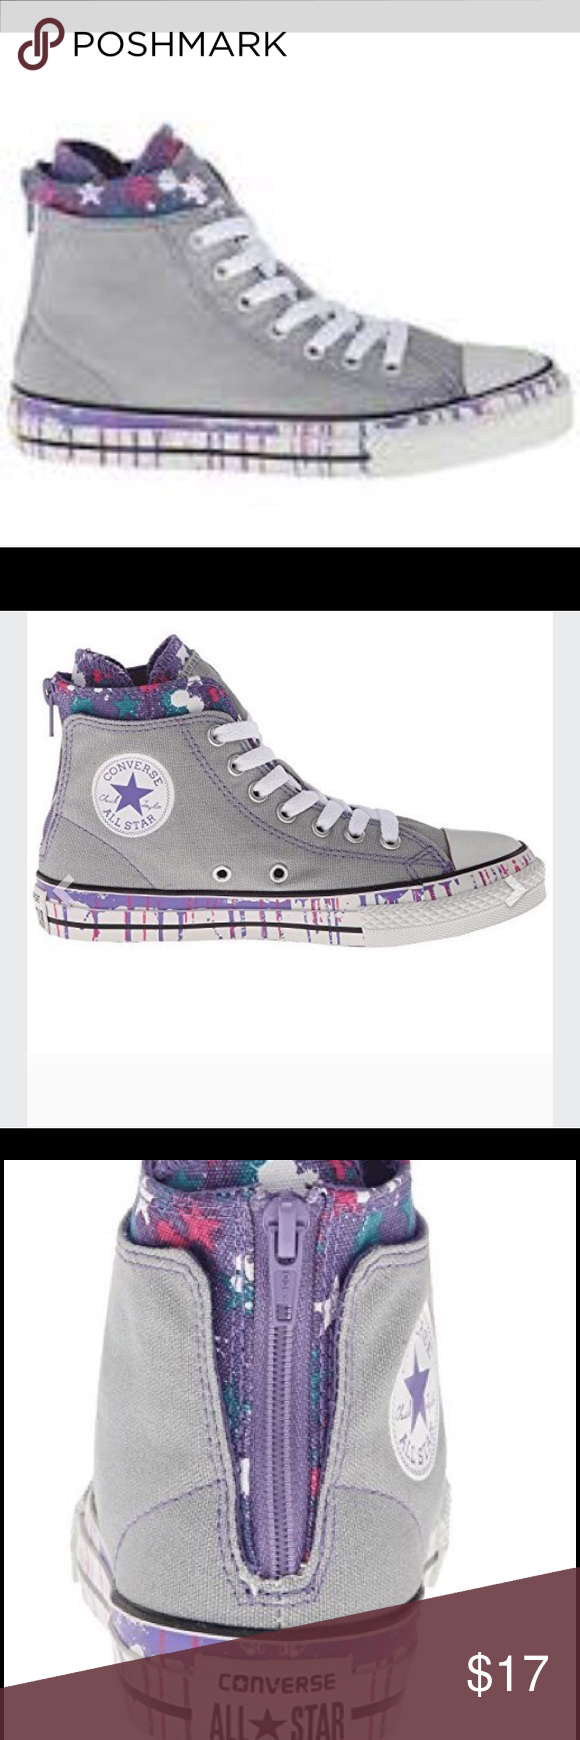 Girls converse grey purple   pink High tops Cute girls grey and purple high  tops with zipper in back Converse Shoes Sneakers c4a0ae9b9